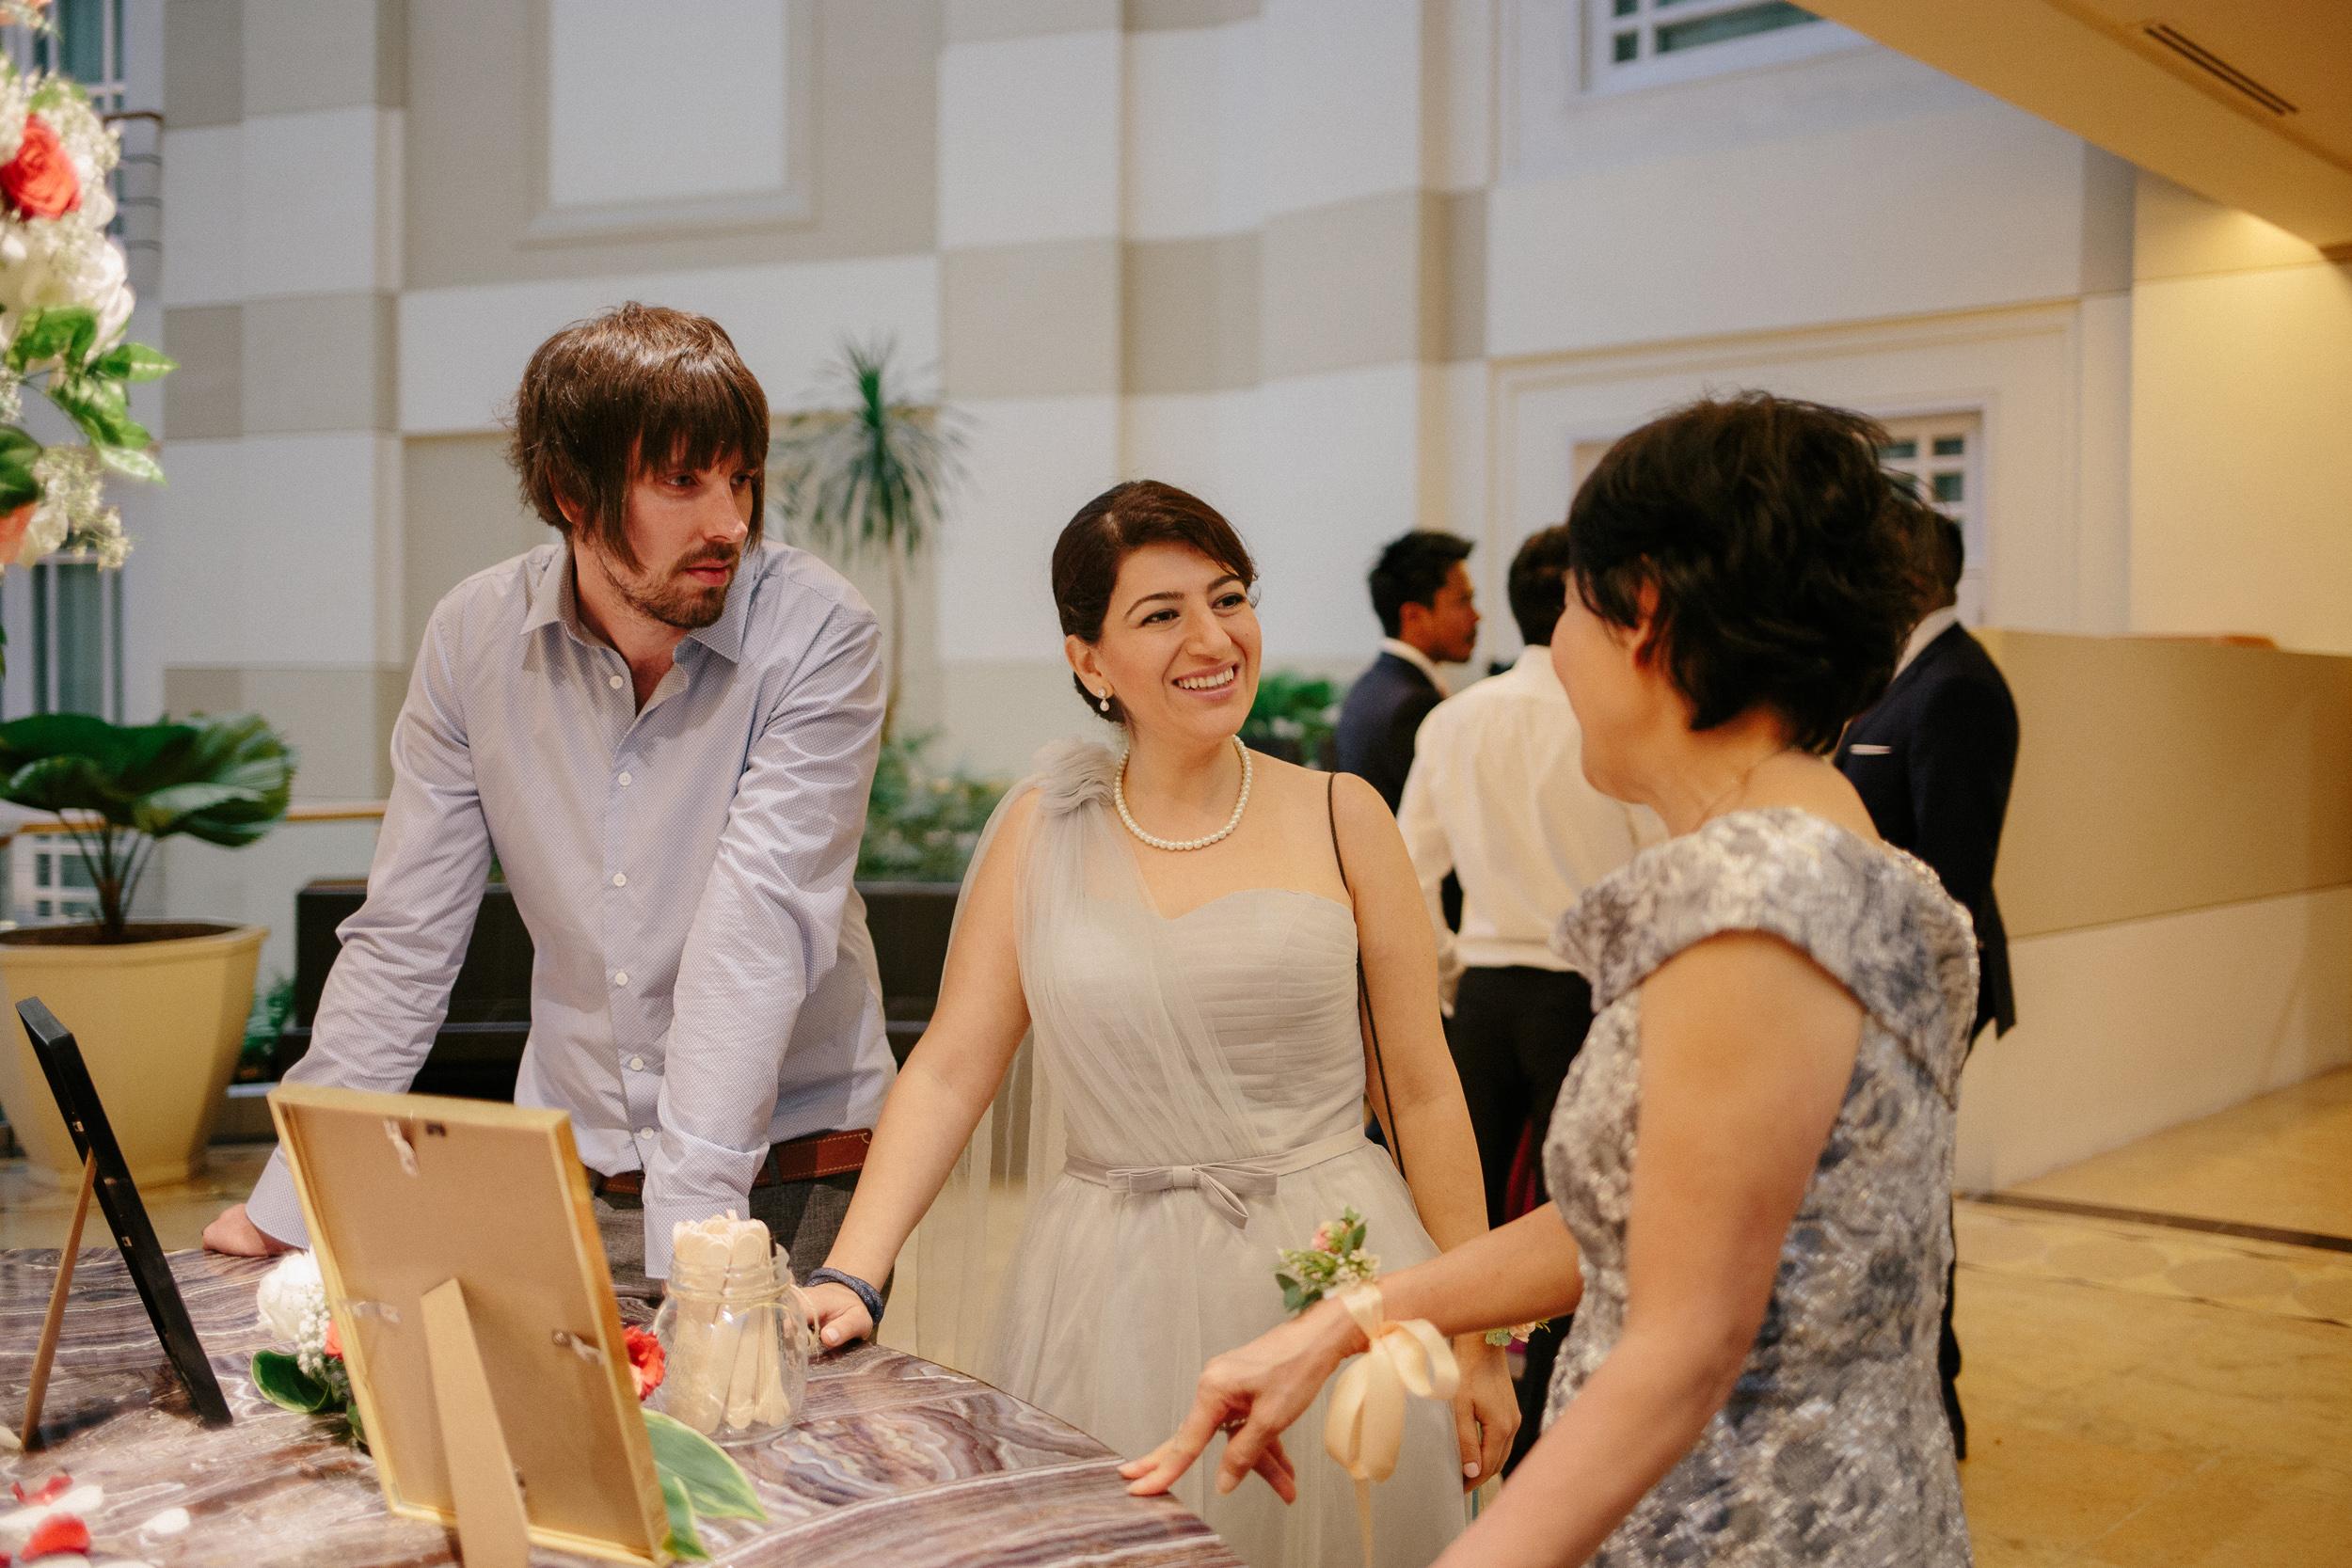 singapore-wedding-photographer-cheryl-matthew-fullerton-hotel-wedding-52.jpg